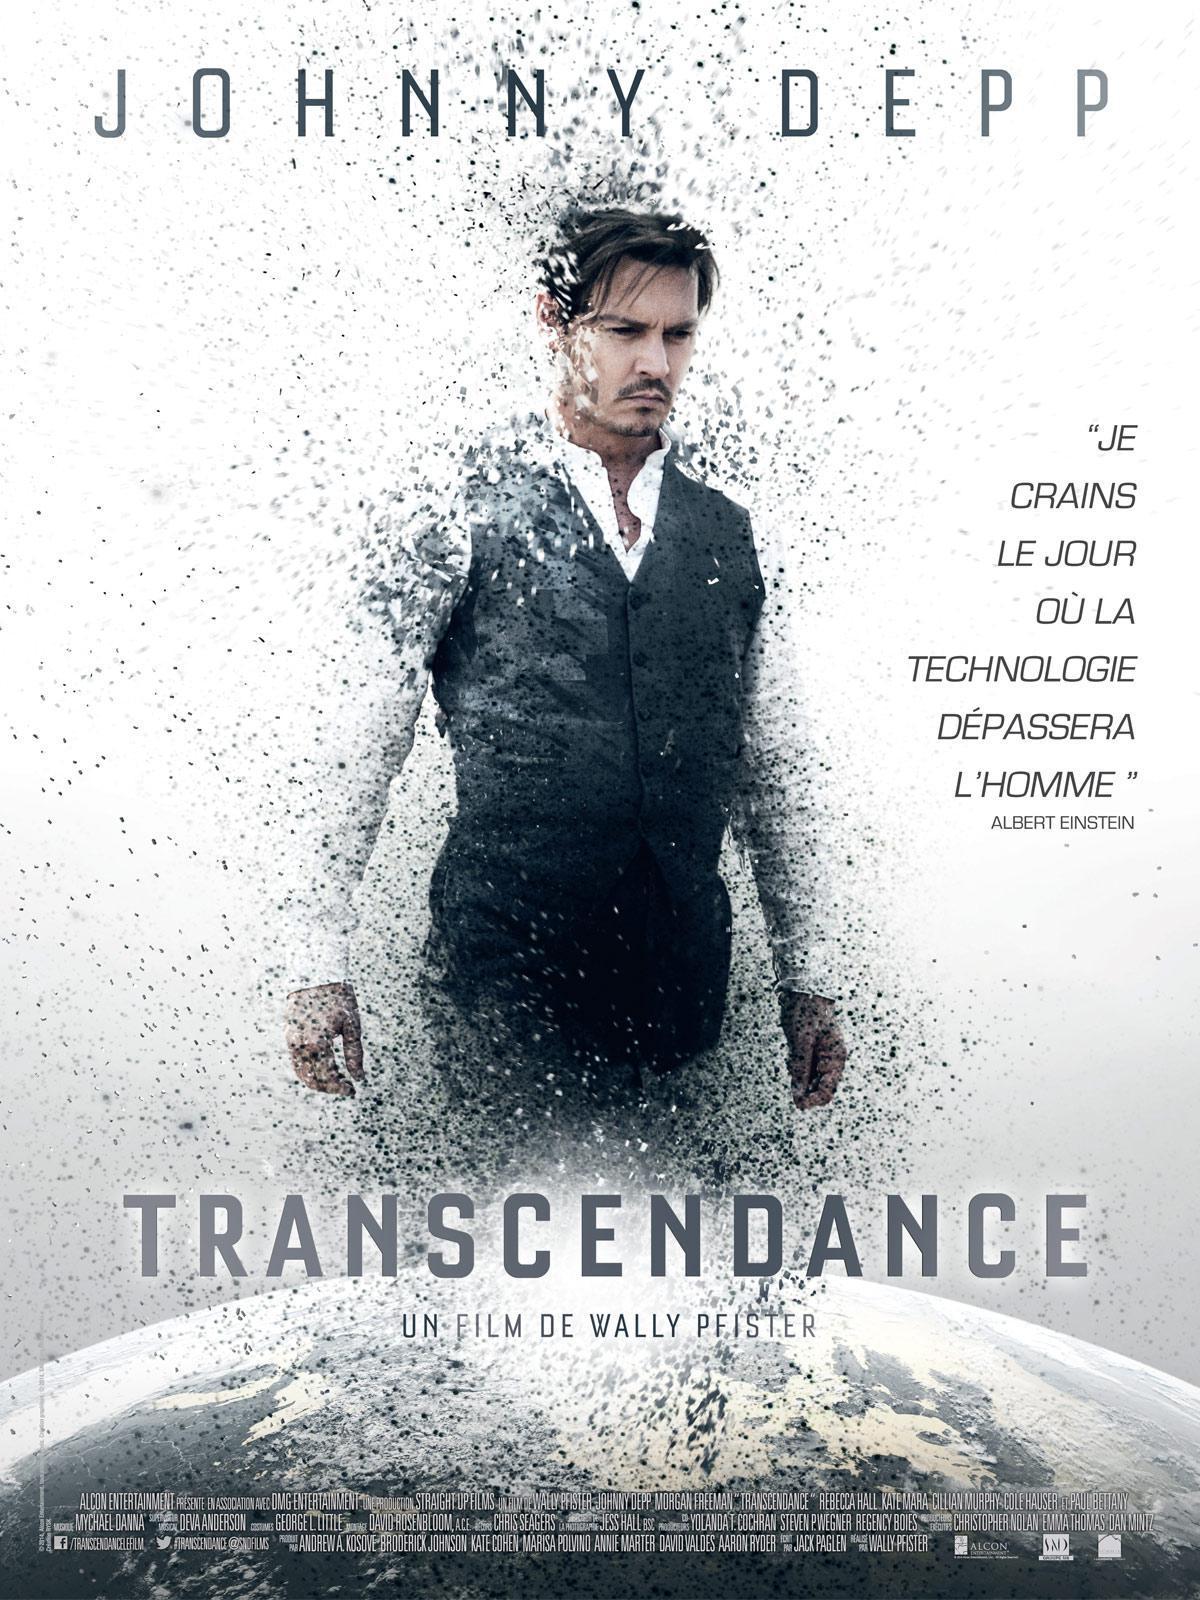 Cinéma : Transcendance de Wally Pfister